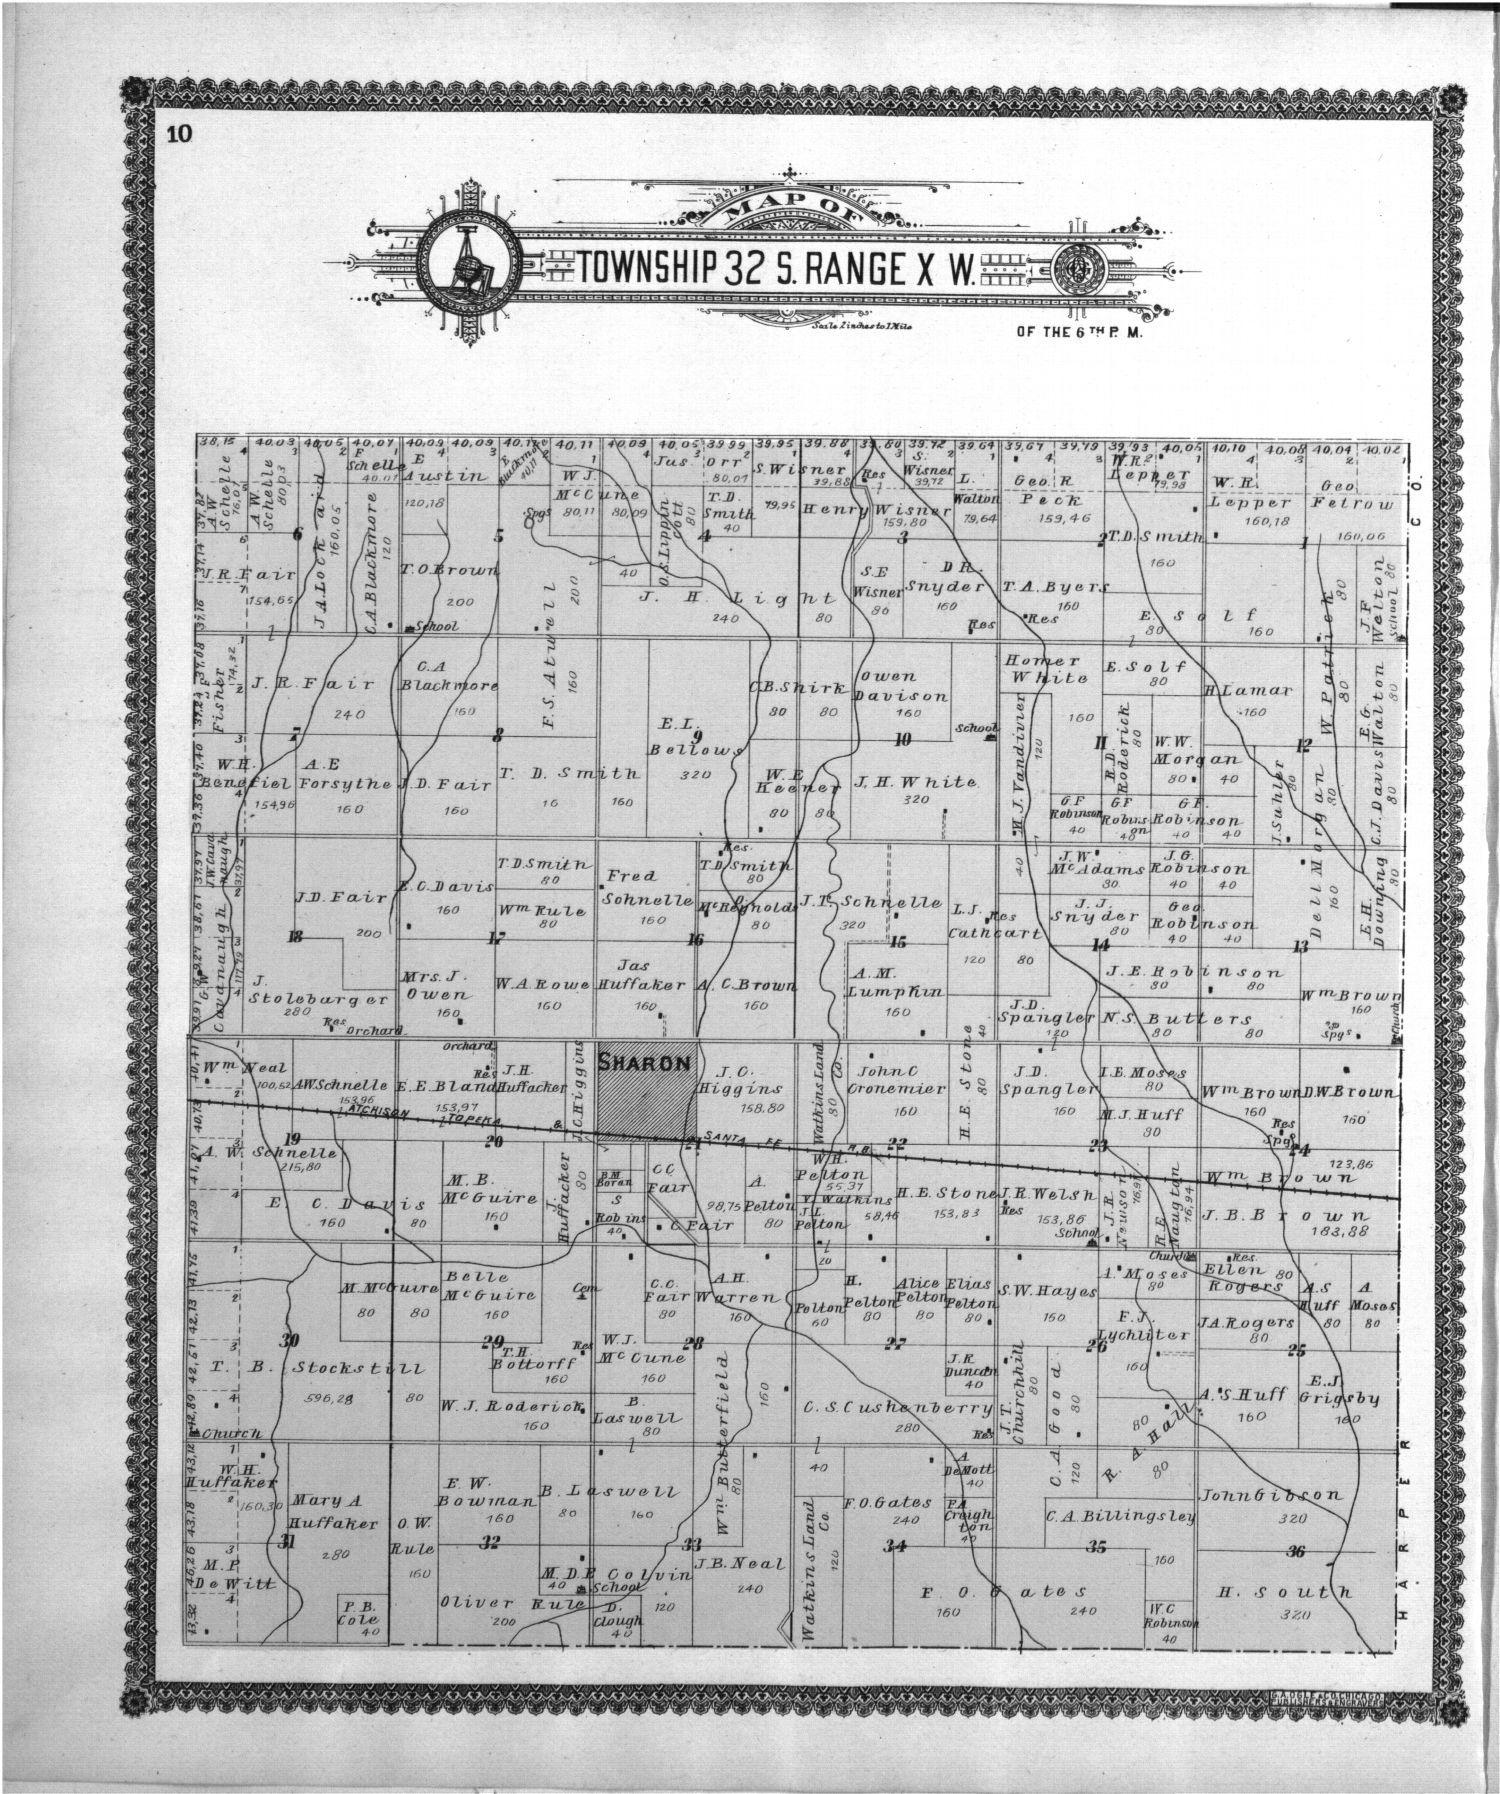 Standard atlas of Barber County, Kansas - 10